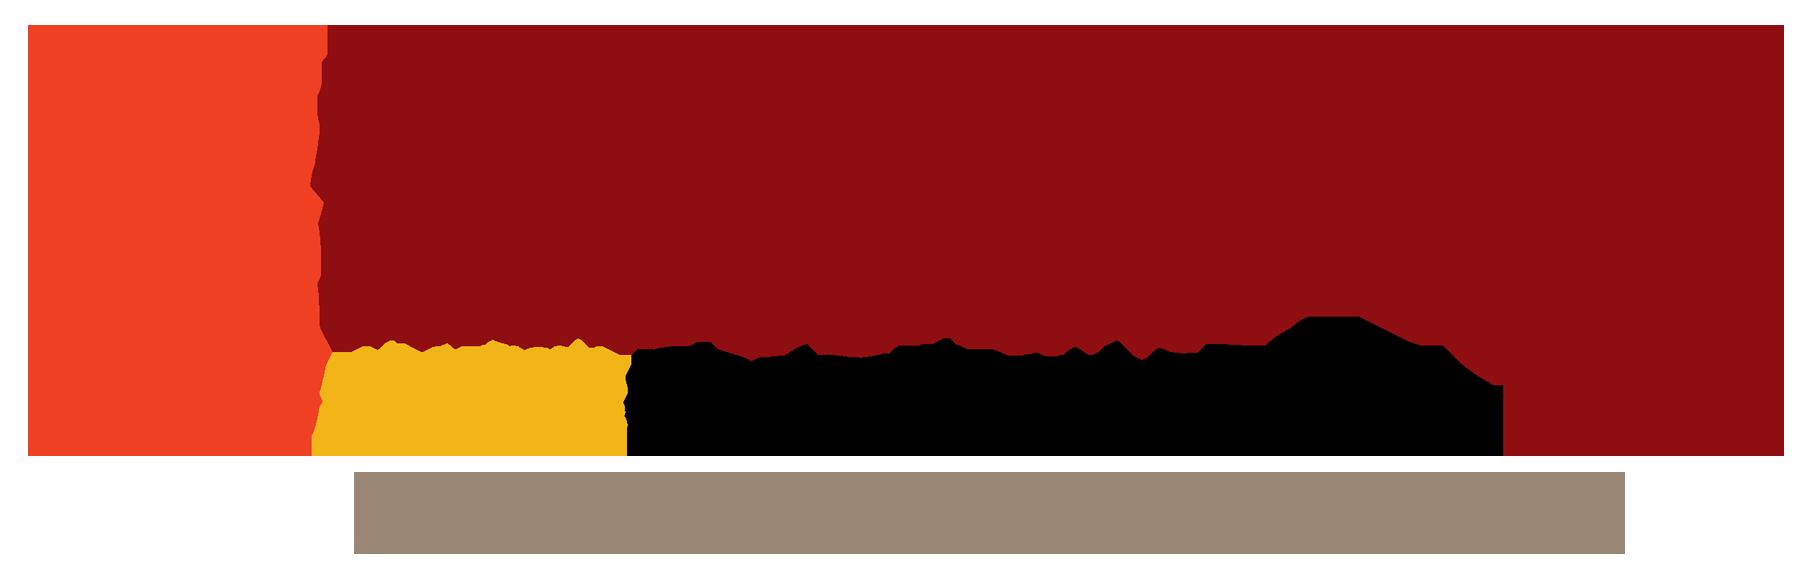 Cardiometabolic Risk Summit